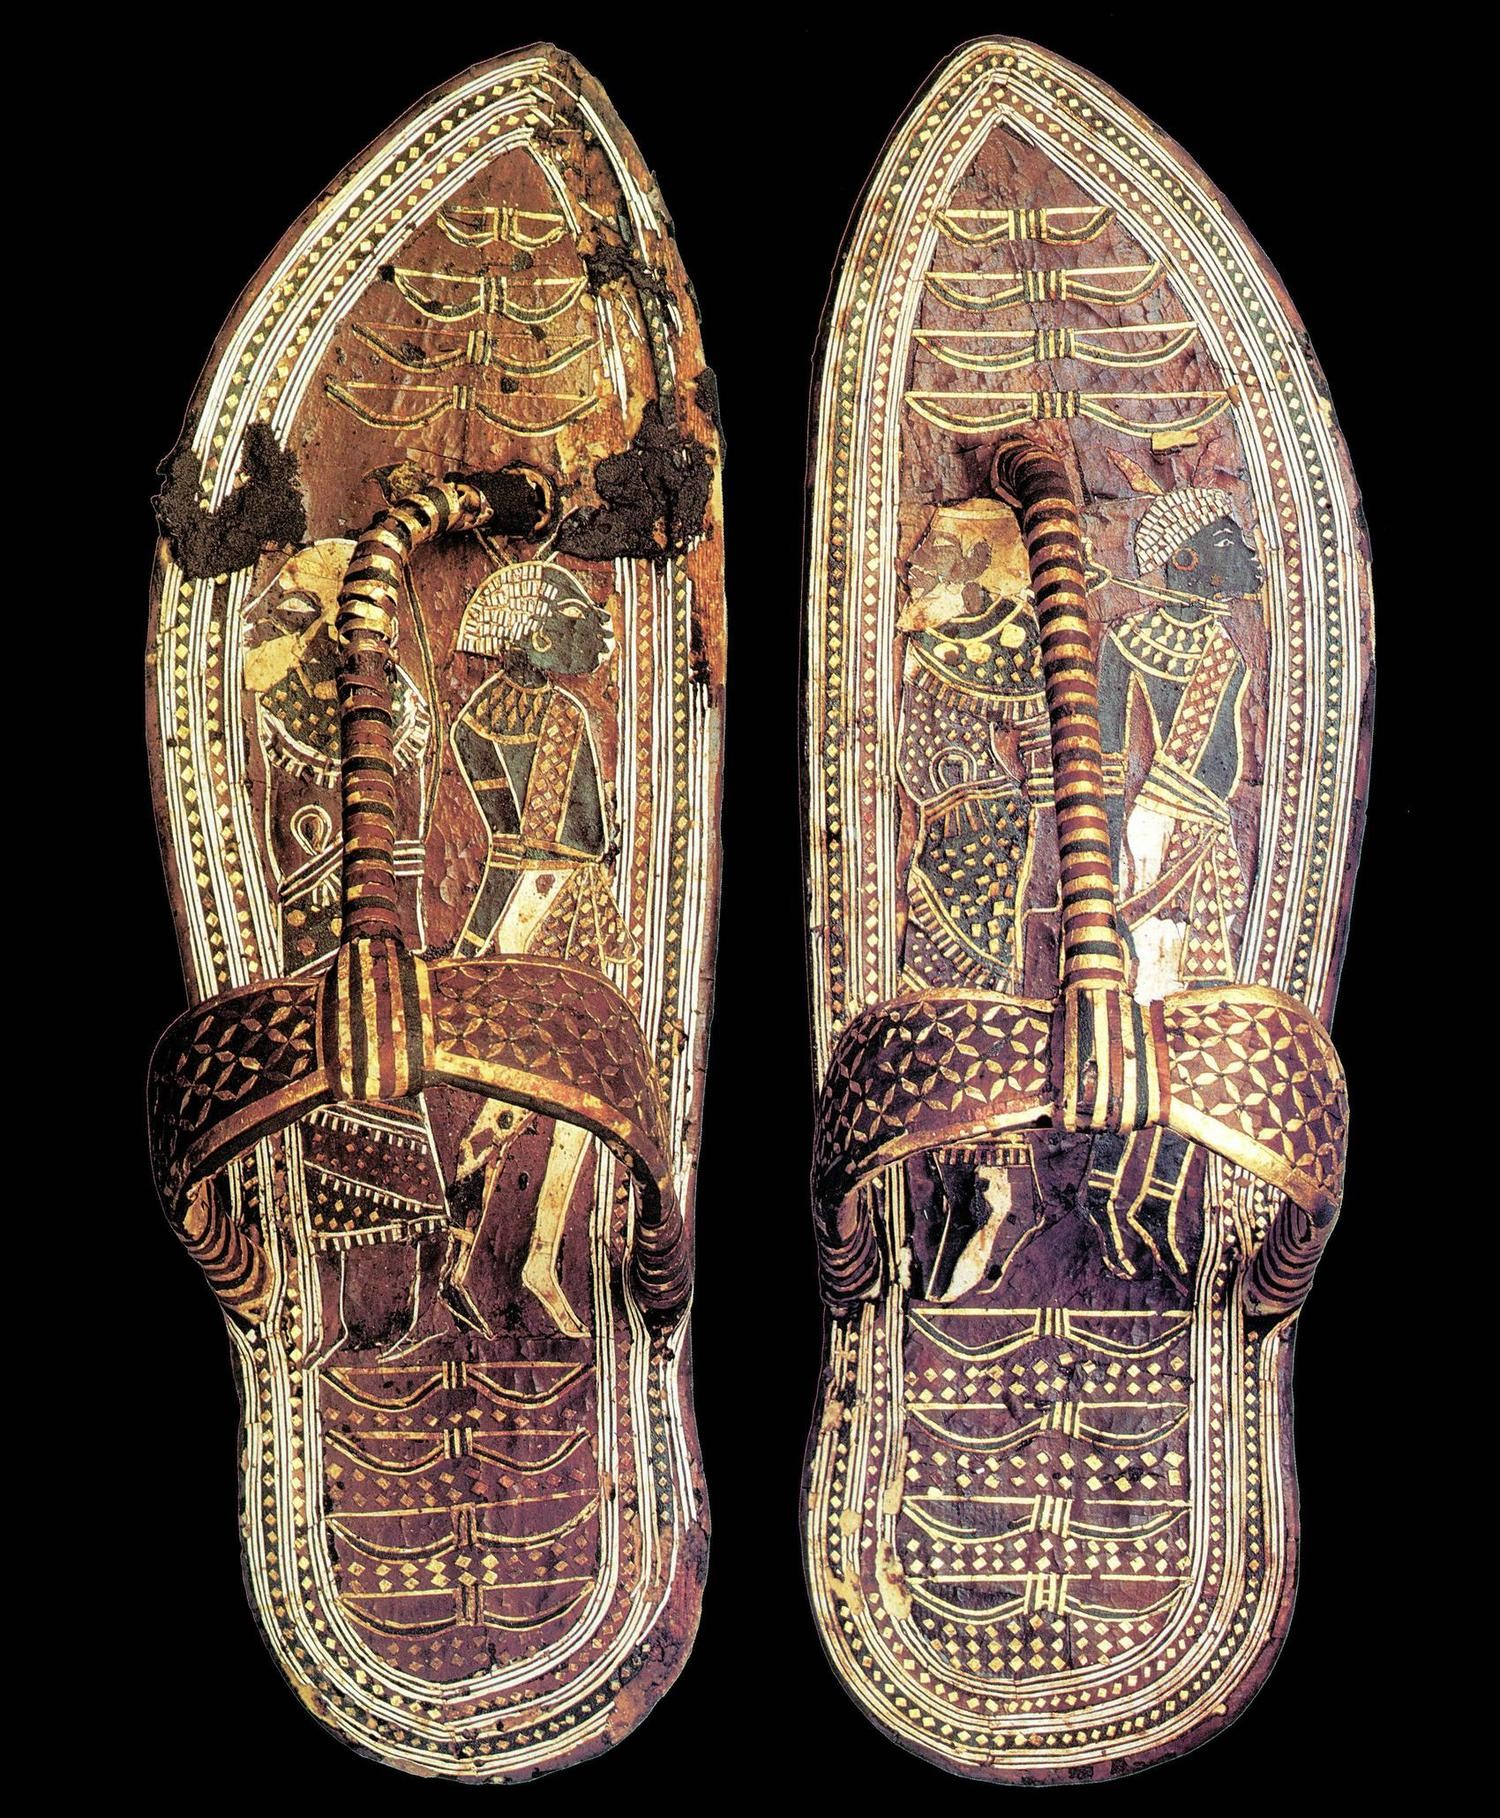 (Foto: The Tutankhamun Exhibit/ Reprodução)